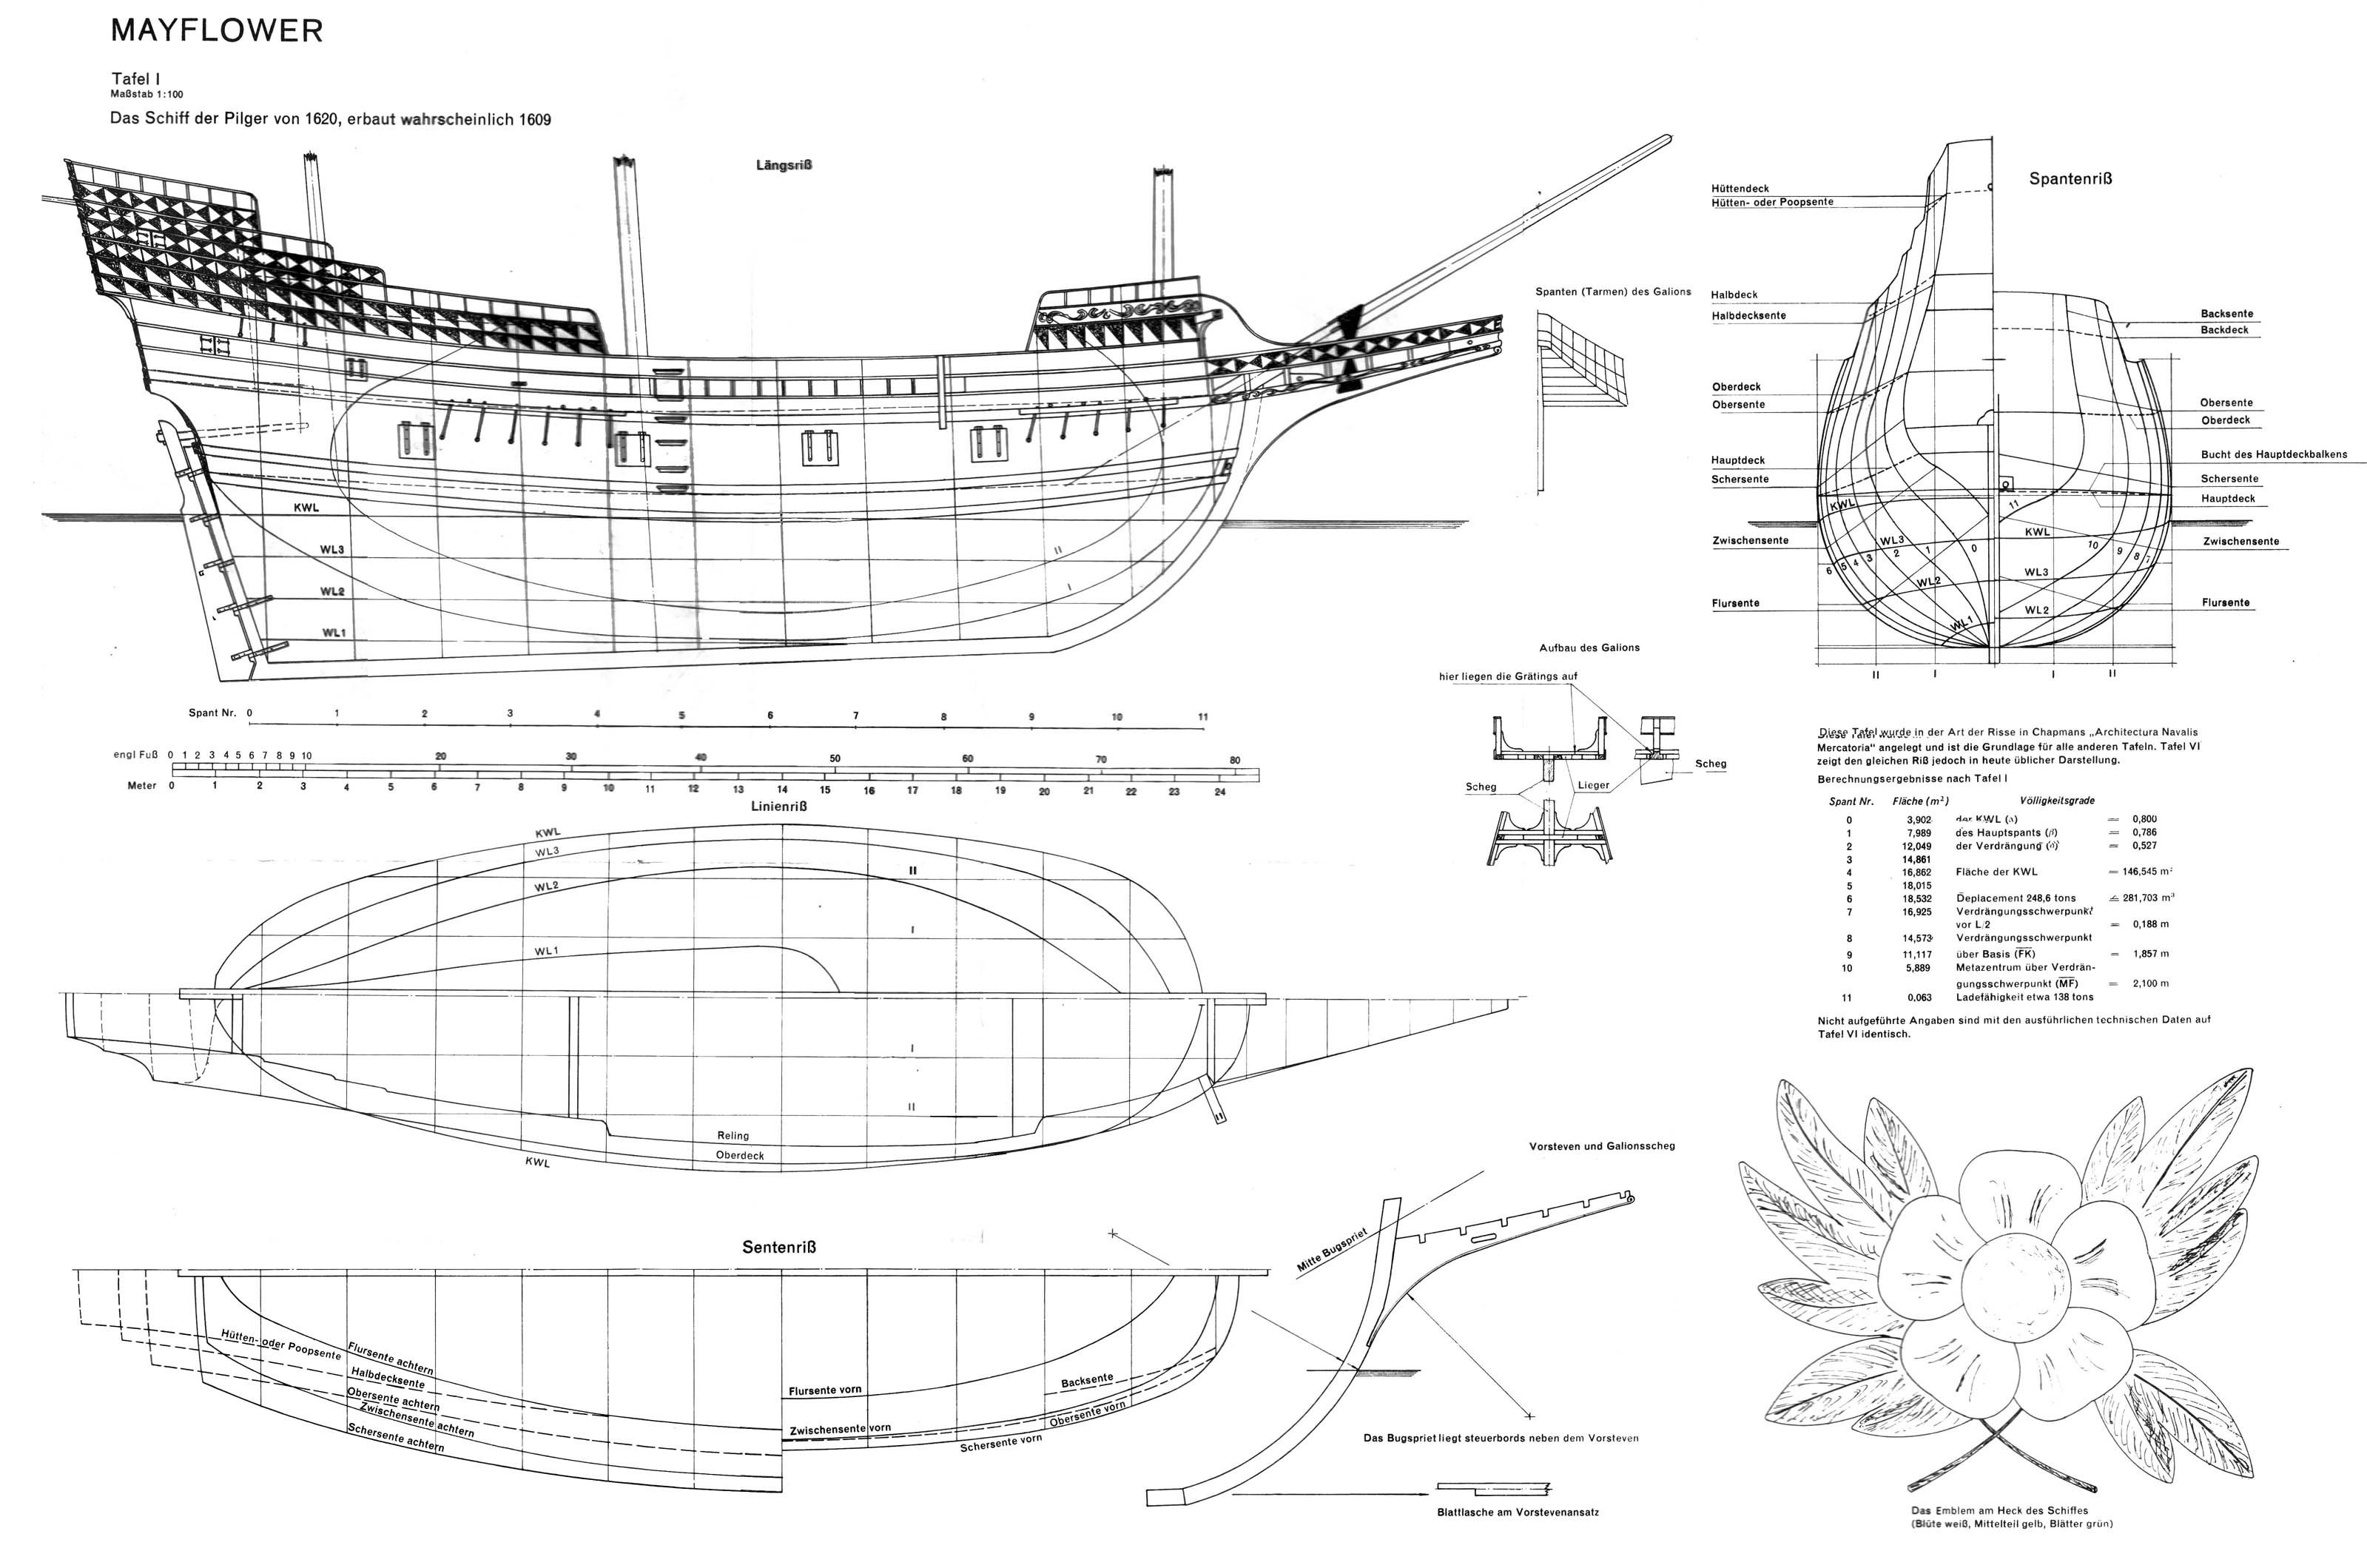 Modelismo naval planos gratis buscar con google - Marqueteria planos gratis ...